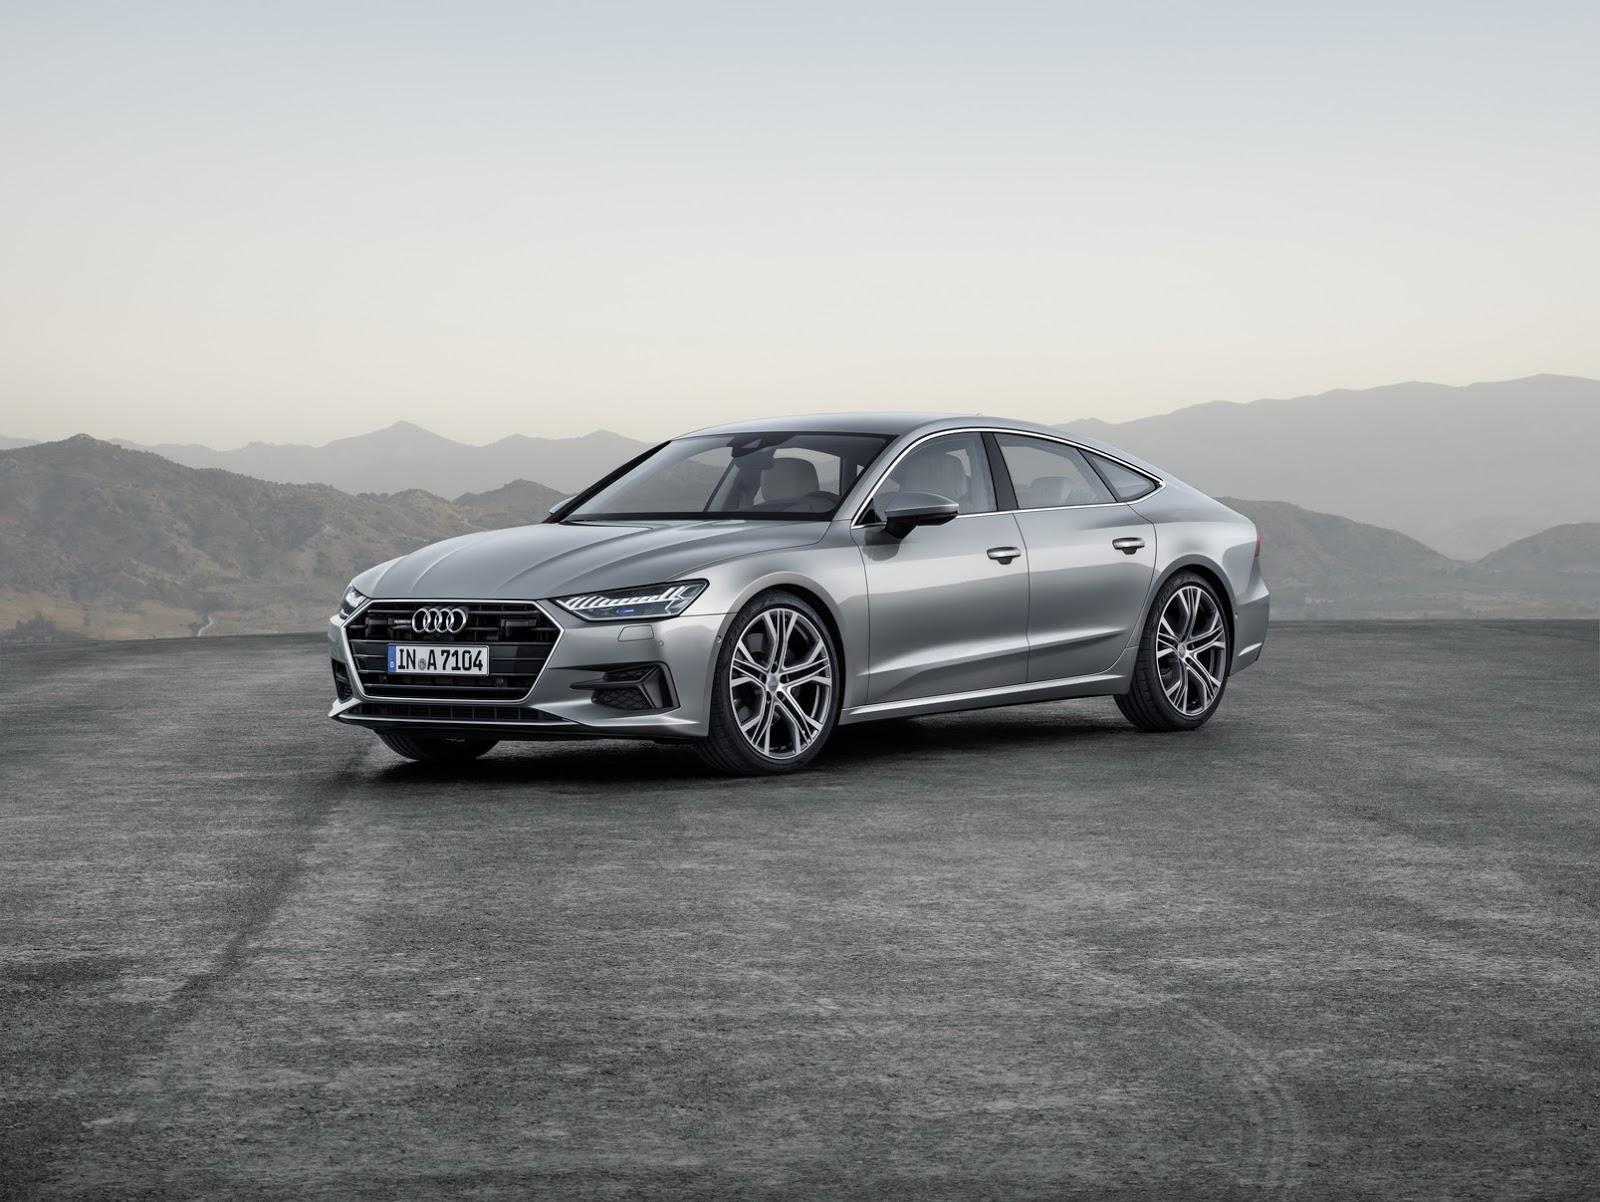 2018_Audi_A7_Sportback_0009